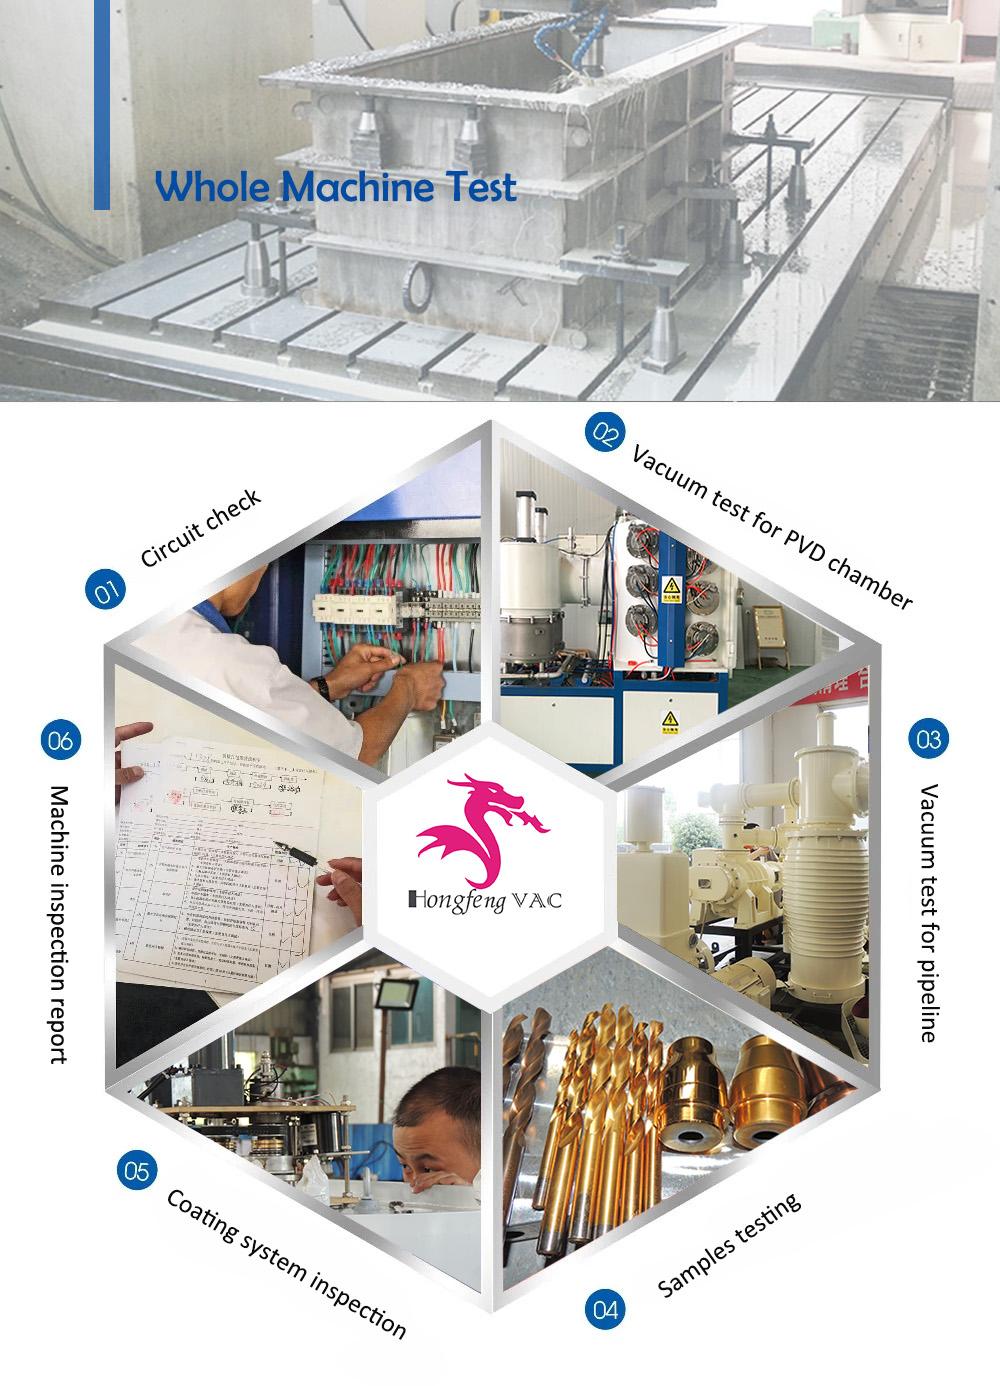 PVD metal coating